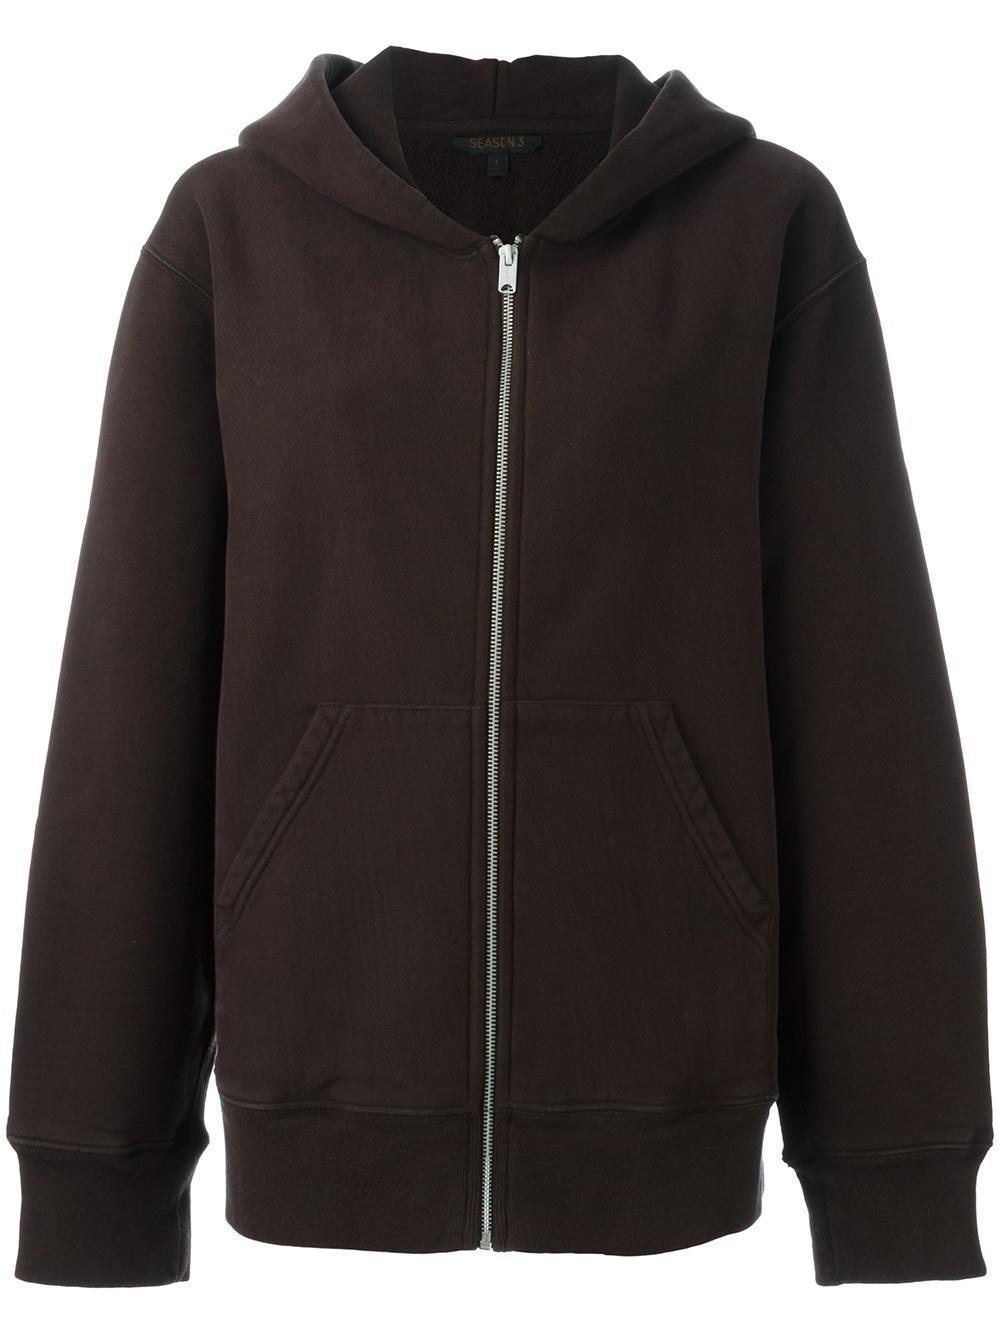 lyst yeezy season 3 oversized hoodie in brown for men. Black Bedroom Furniture Sets. Home Design Ideas